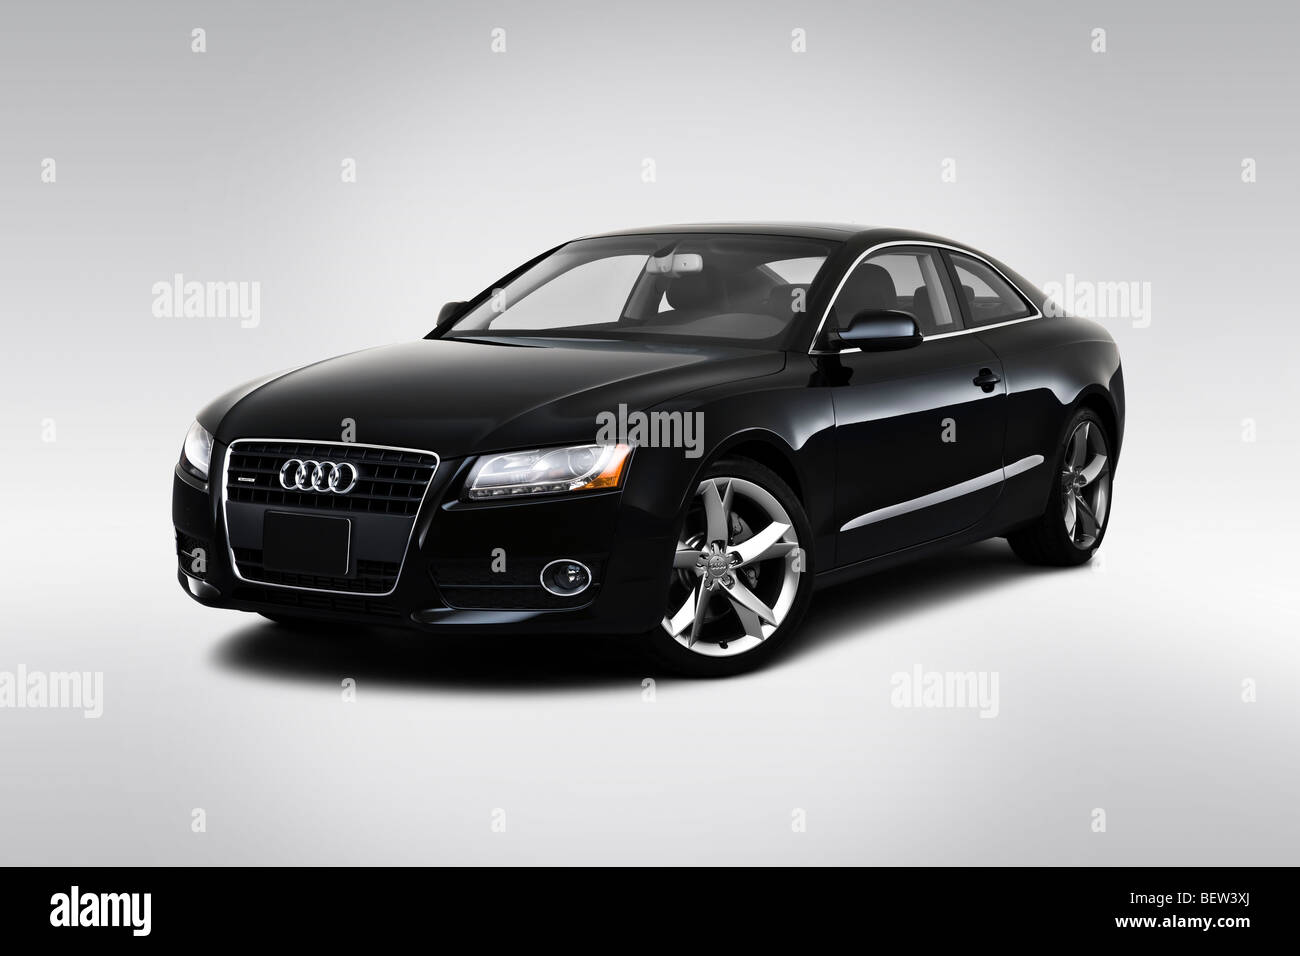 Audi A5 Immagini Audi A5 Fotos Stock Alamy